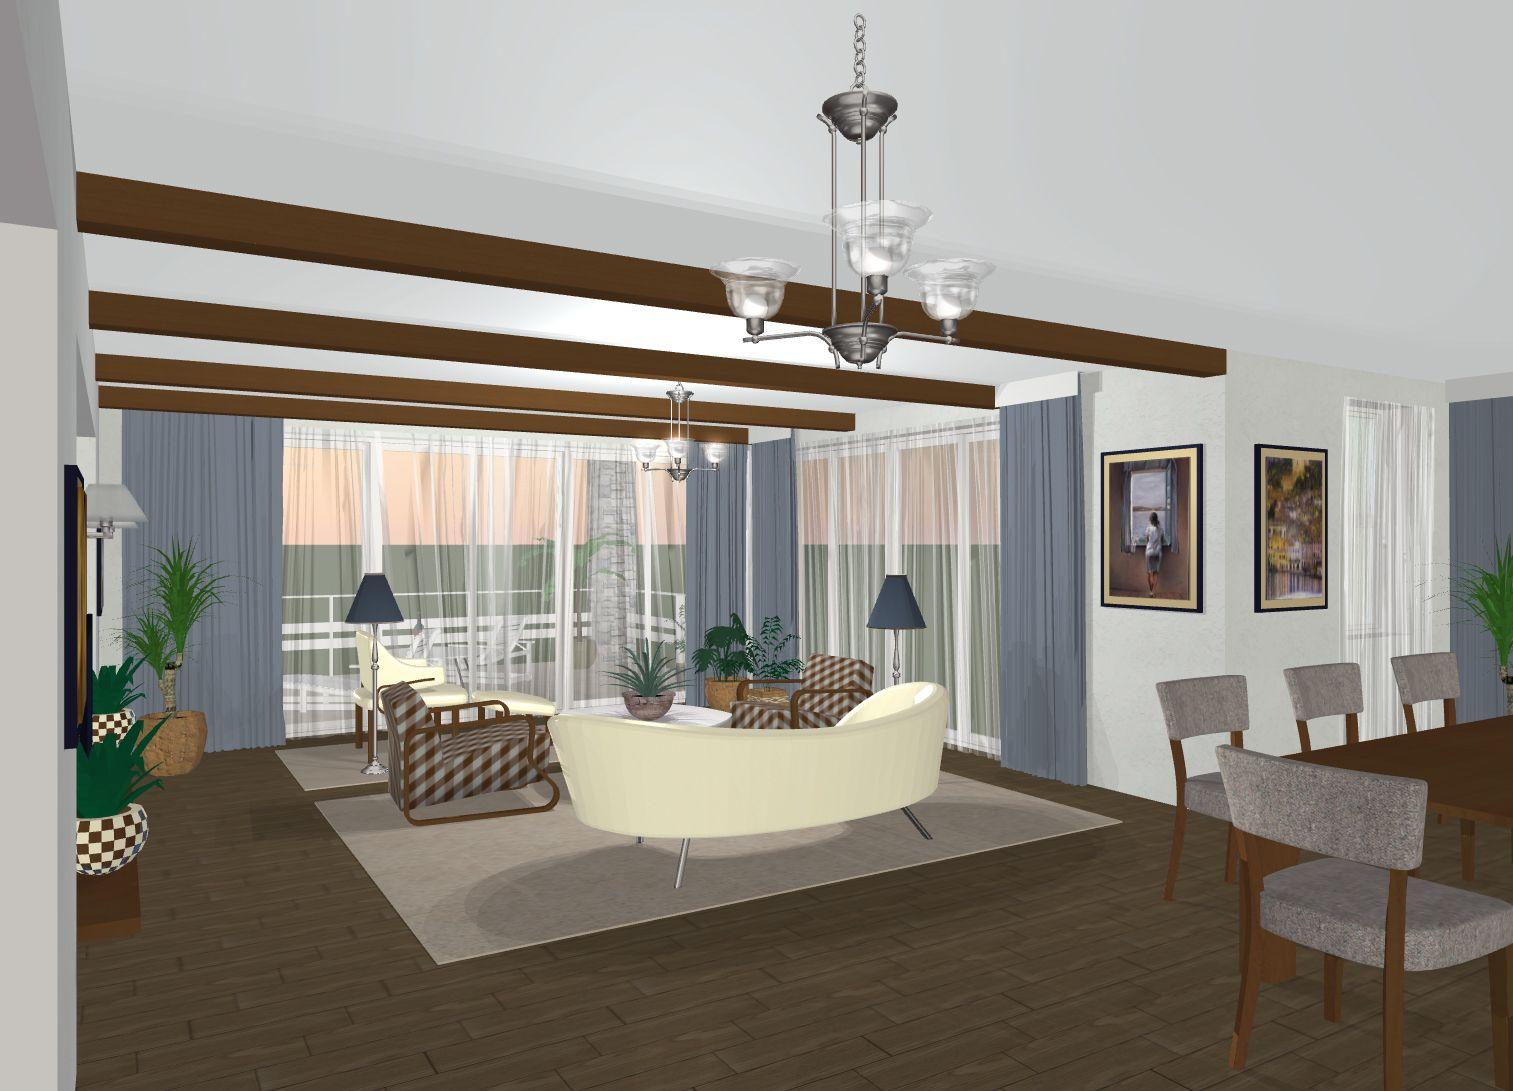 Modern Interior Design Created In Livehome3d Interior Design Software Best Interior Design Websites Interior Design Career